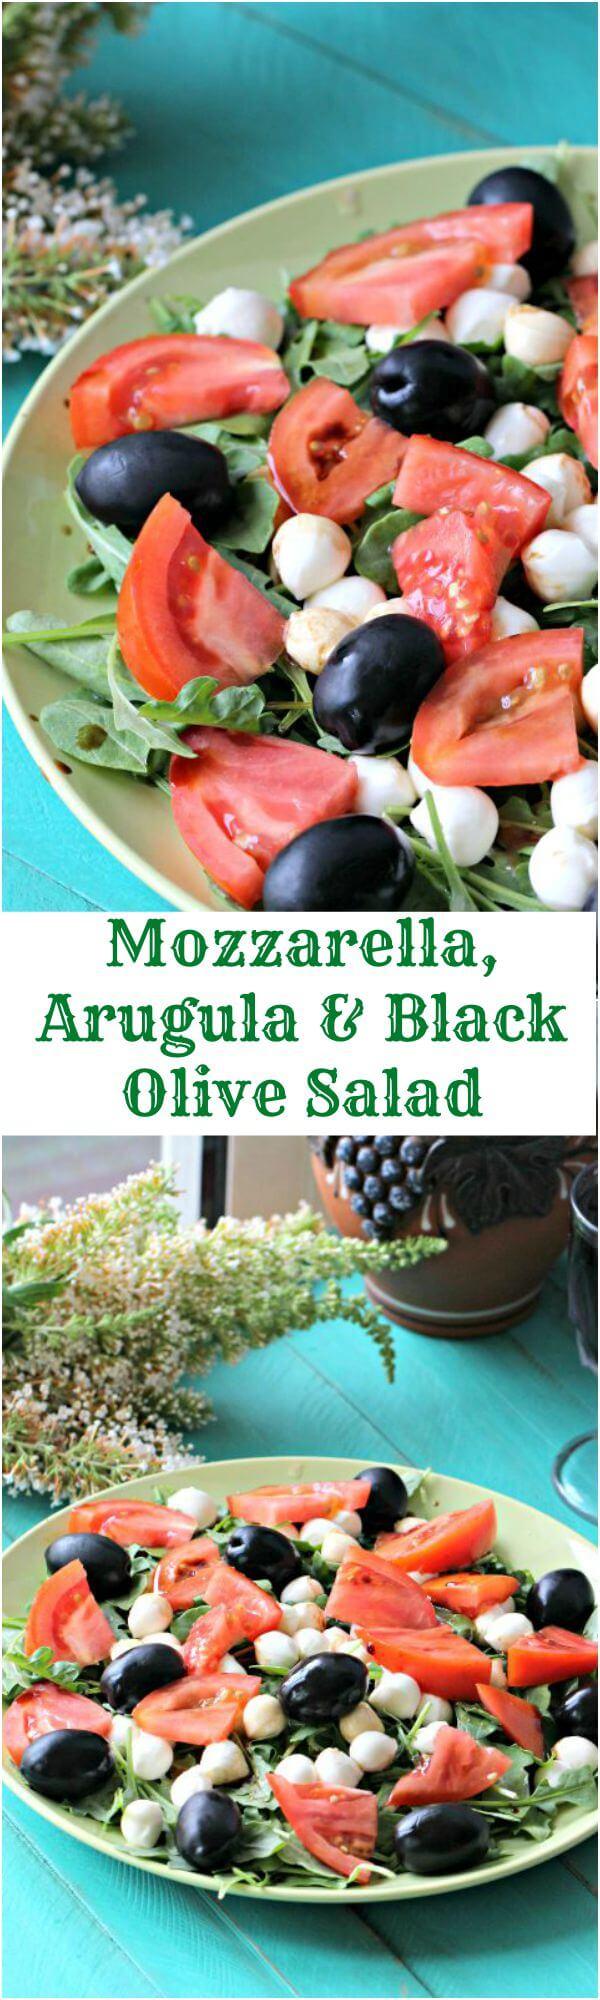 Mozzarella Arugula Salad with Black Olives